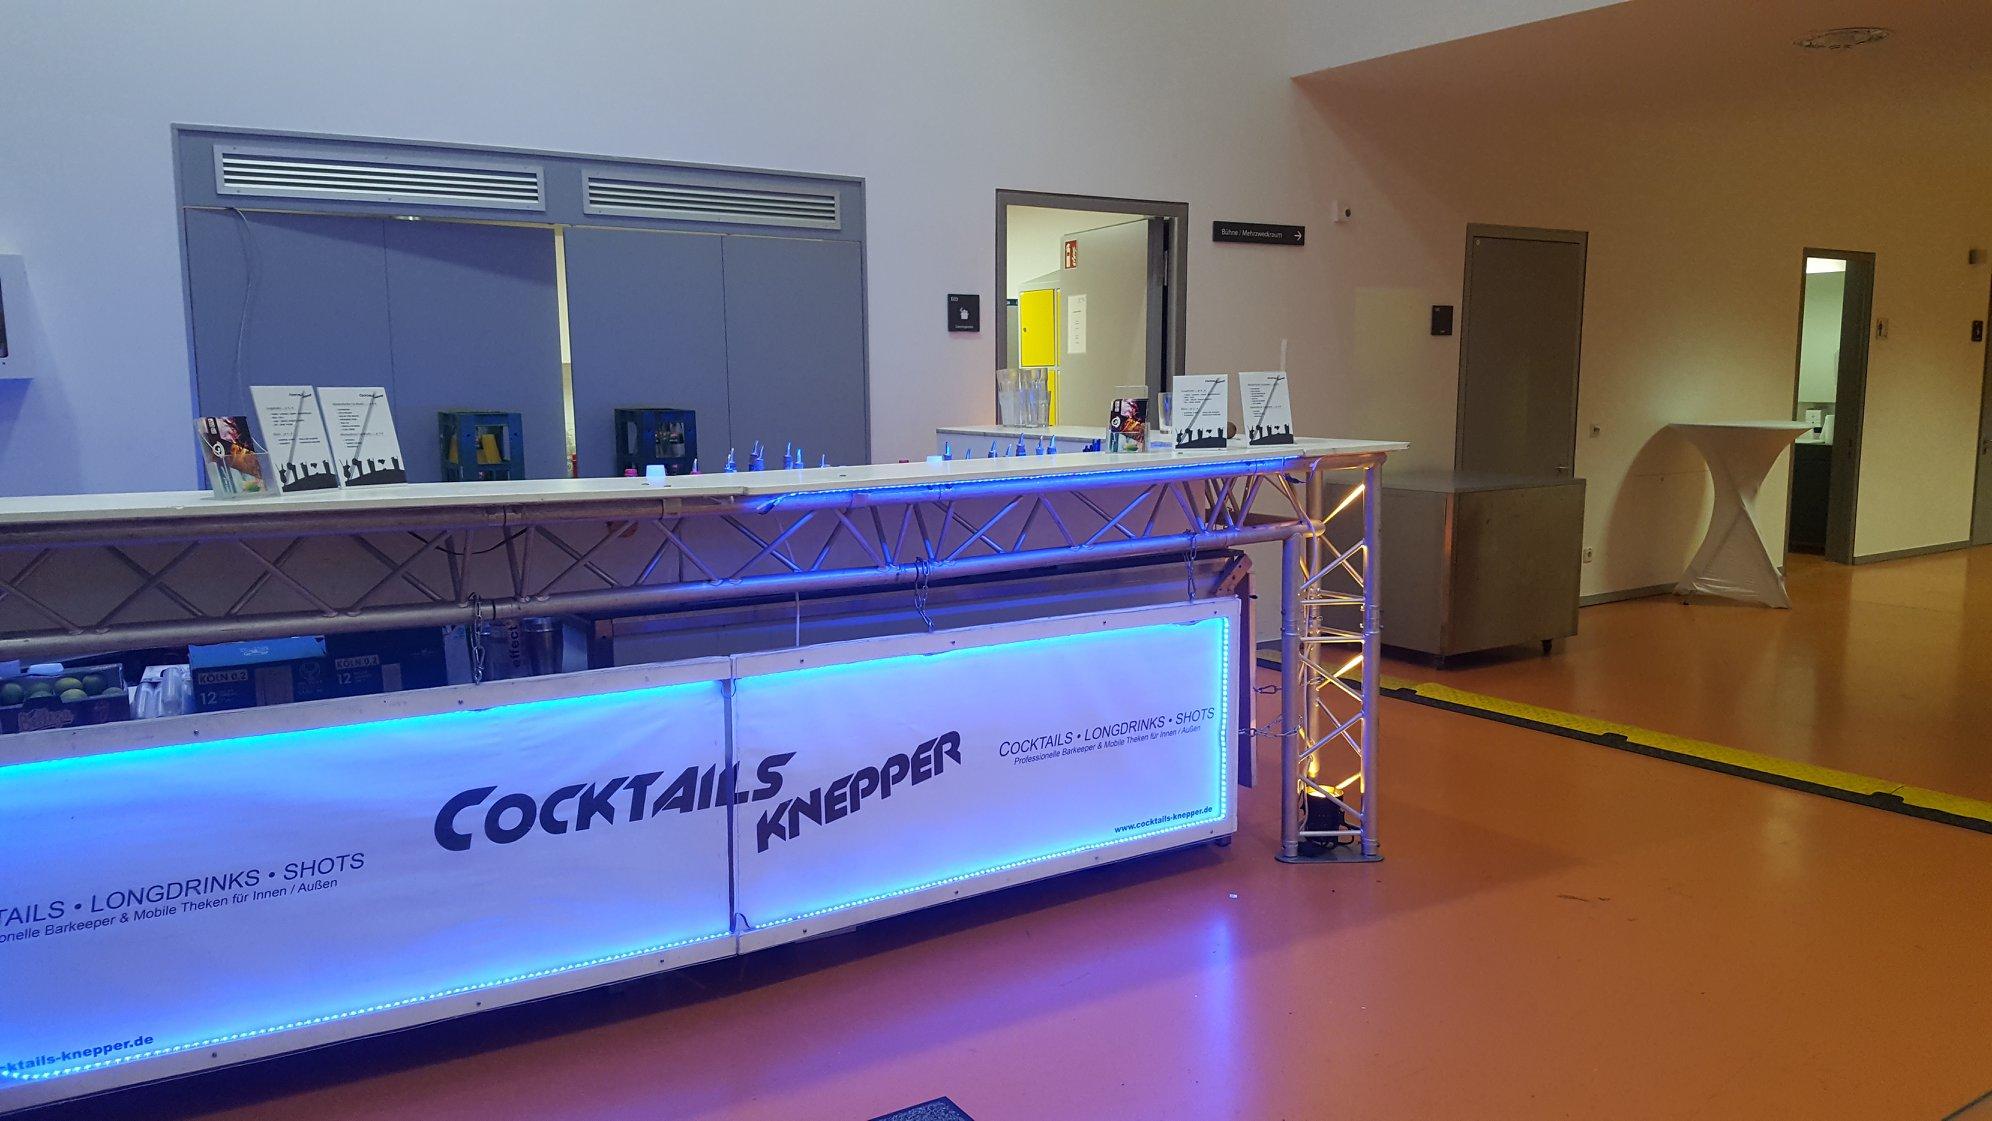 Cocktails Knepper - mobile Cocktailbar in Iserlohn- Cocktails zum Abiball (2)